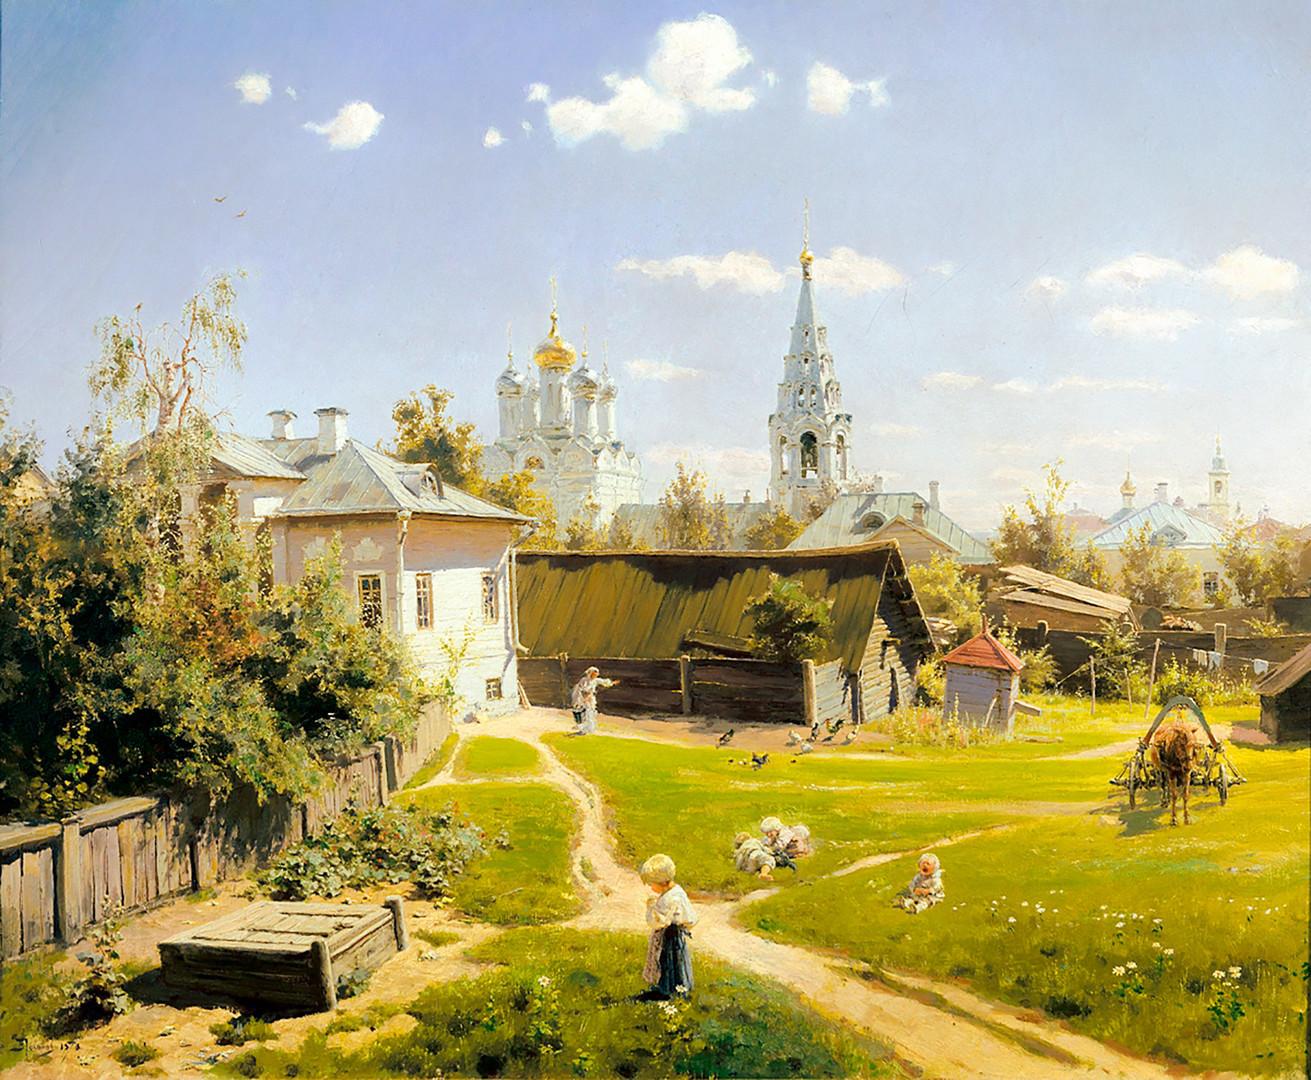 Vassíli Polenov. Quintal em Moscou, 1878